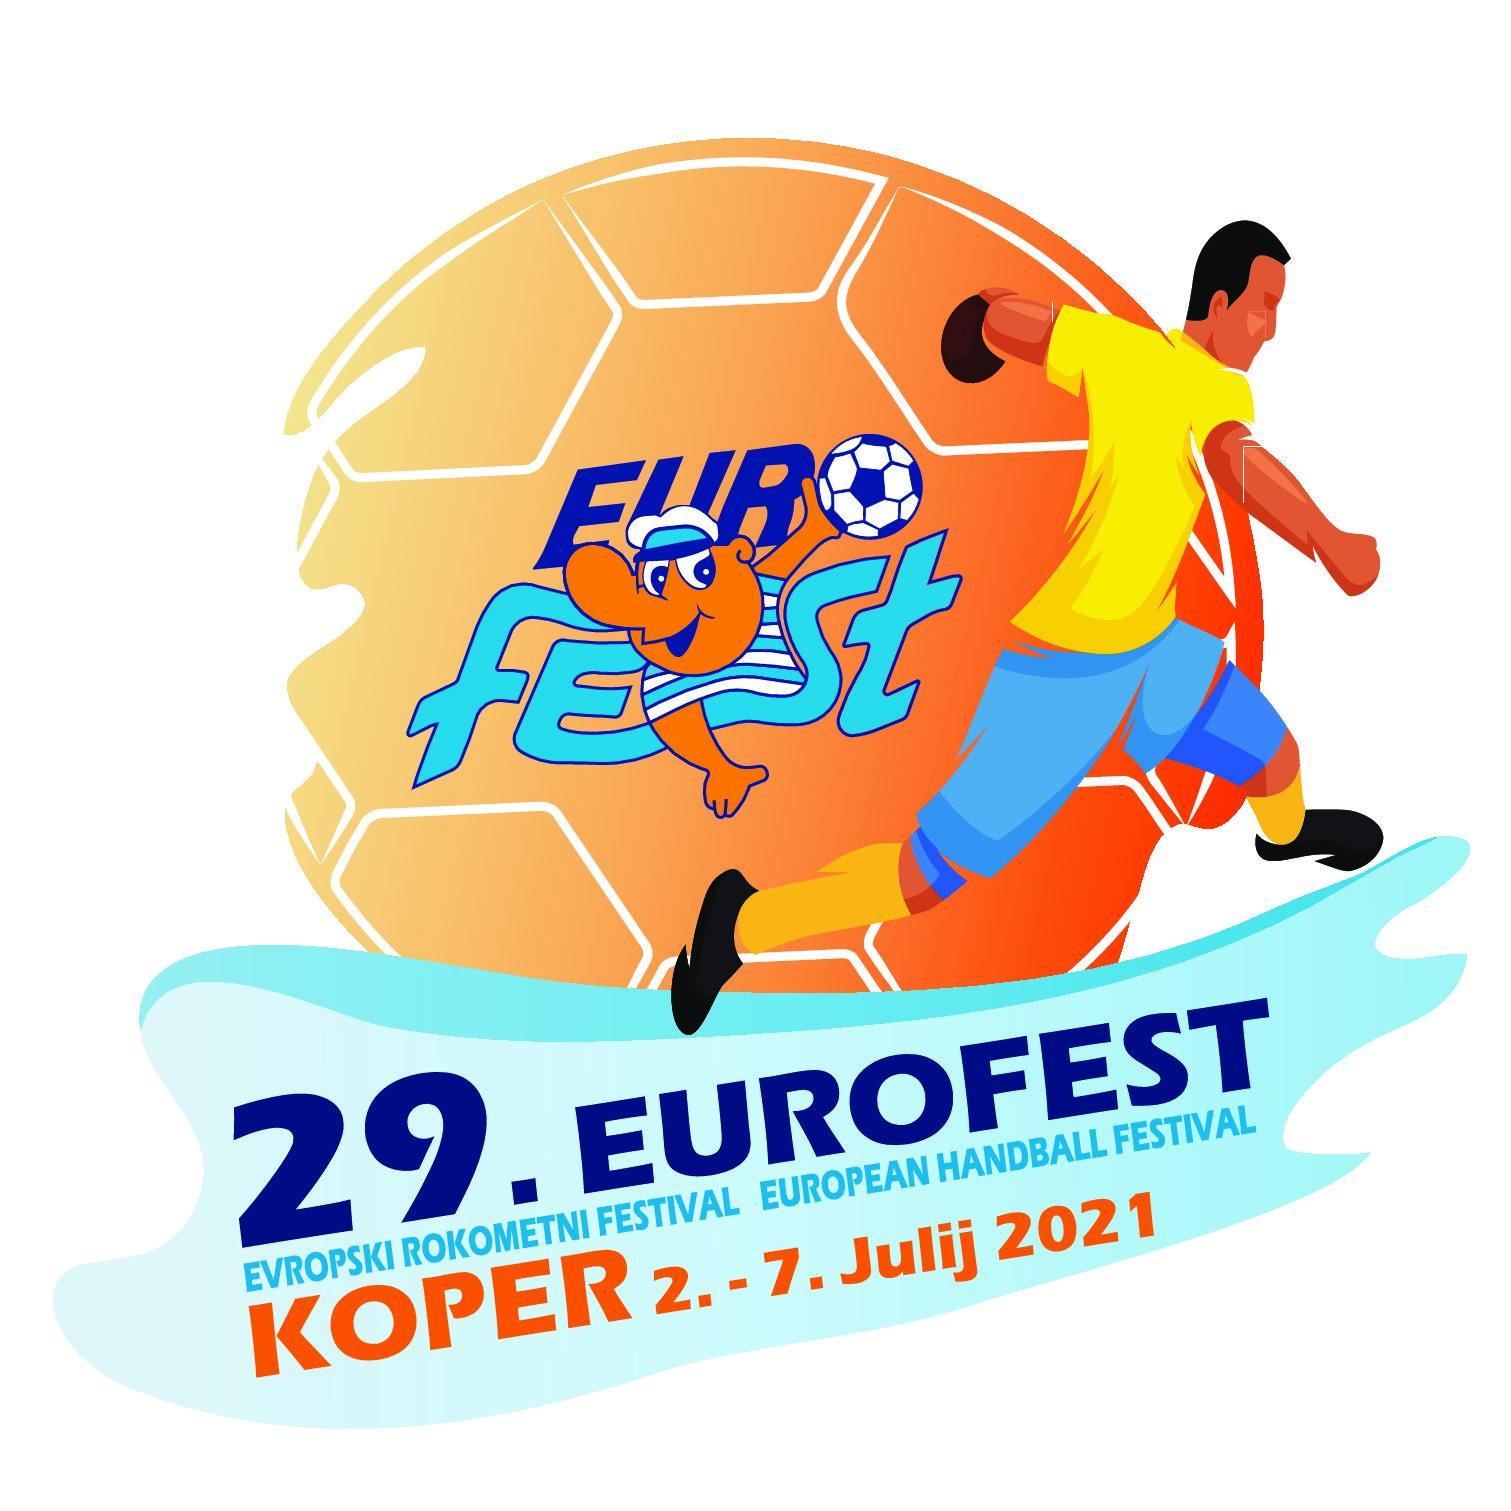 https://handball.eurofest.si/wp-content/uploads/2020/10/29.-EUROFEST-logo-3-pdf.jpg